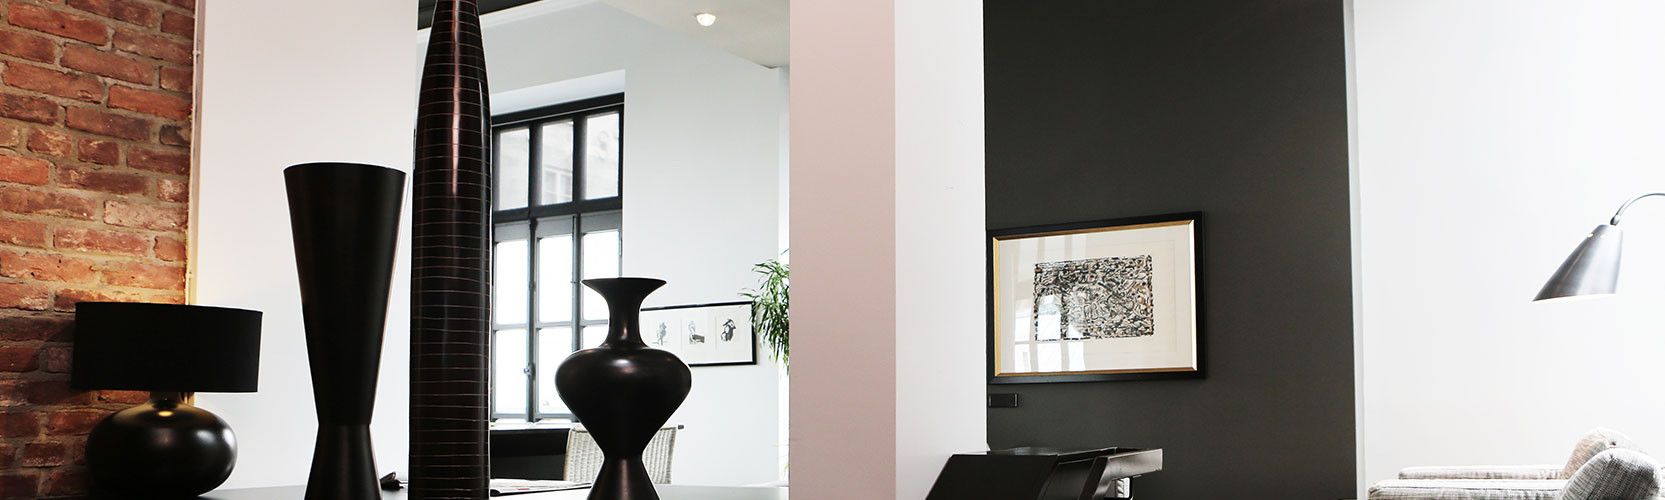 Innenräume Maler Hellkuhl